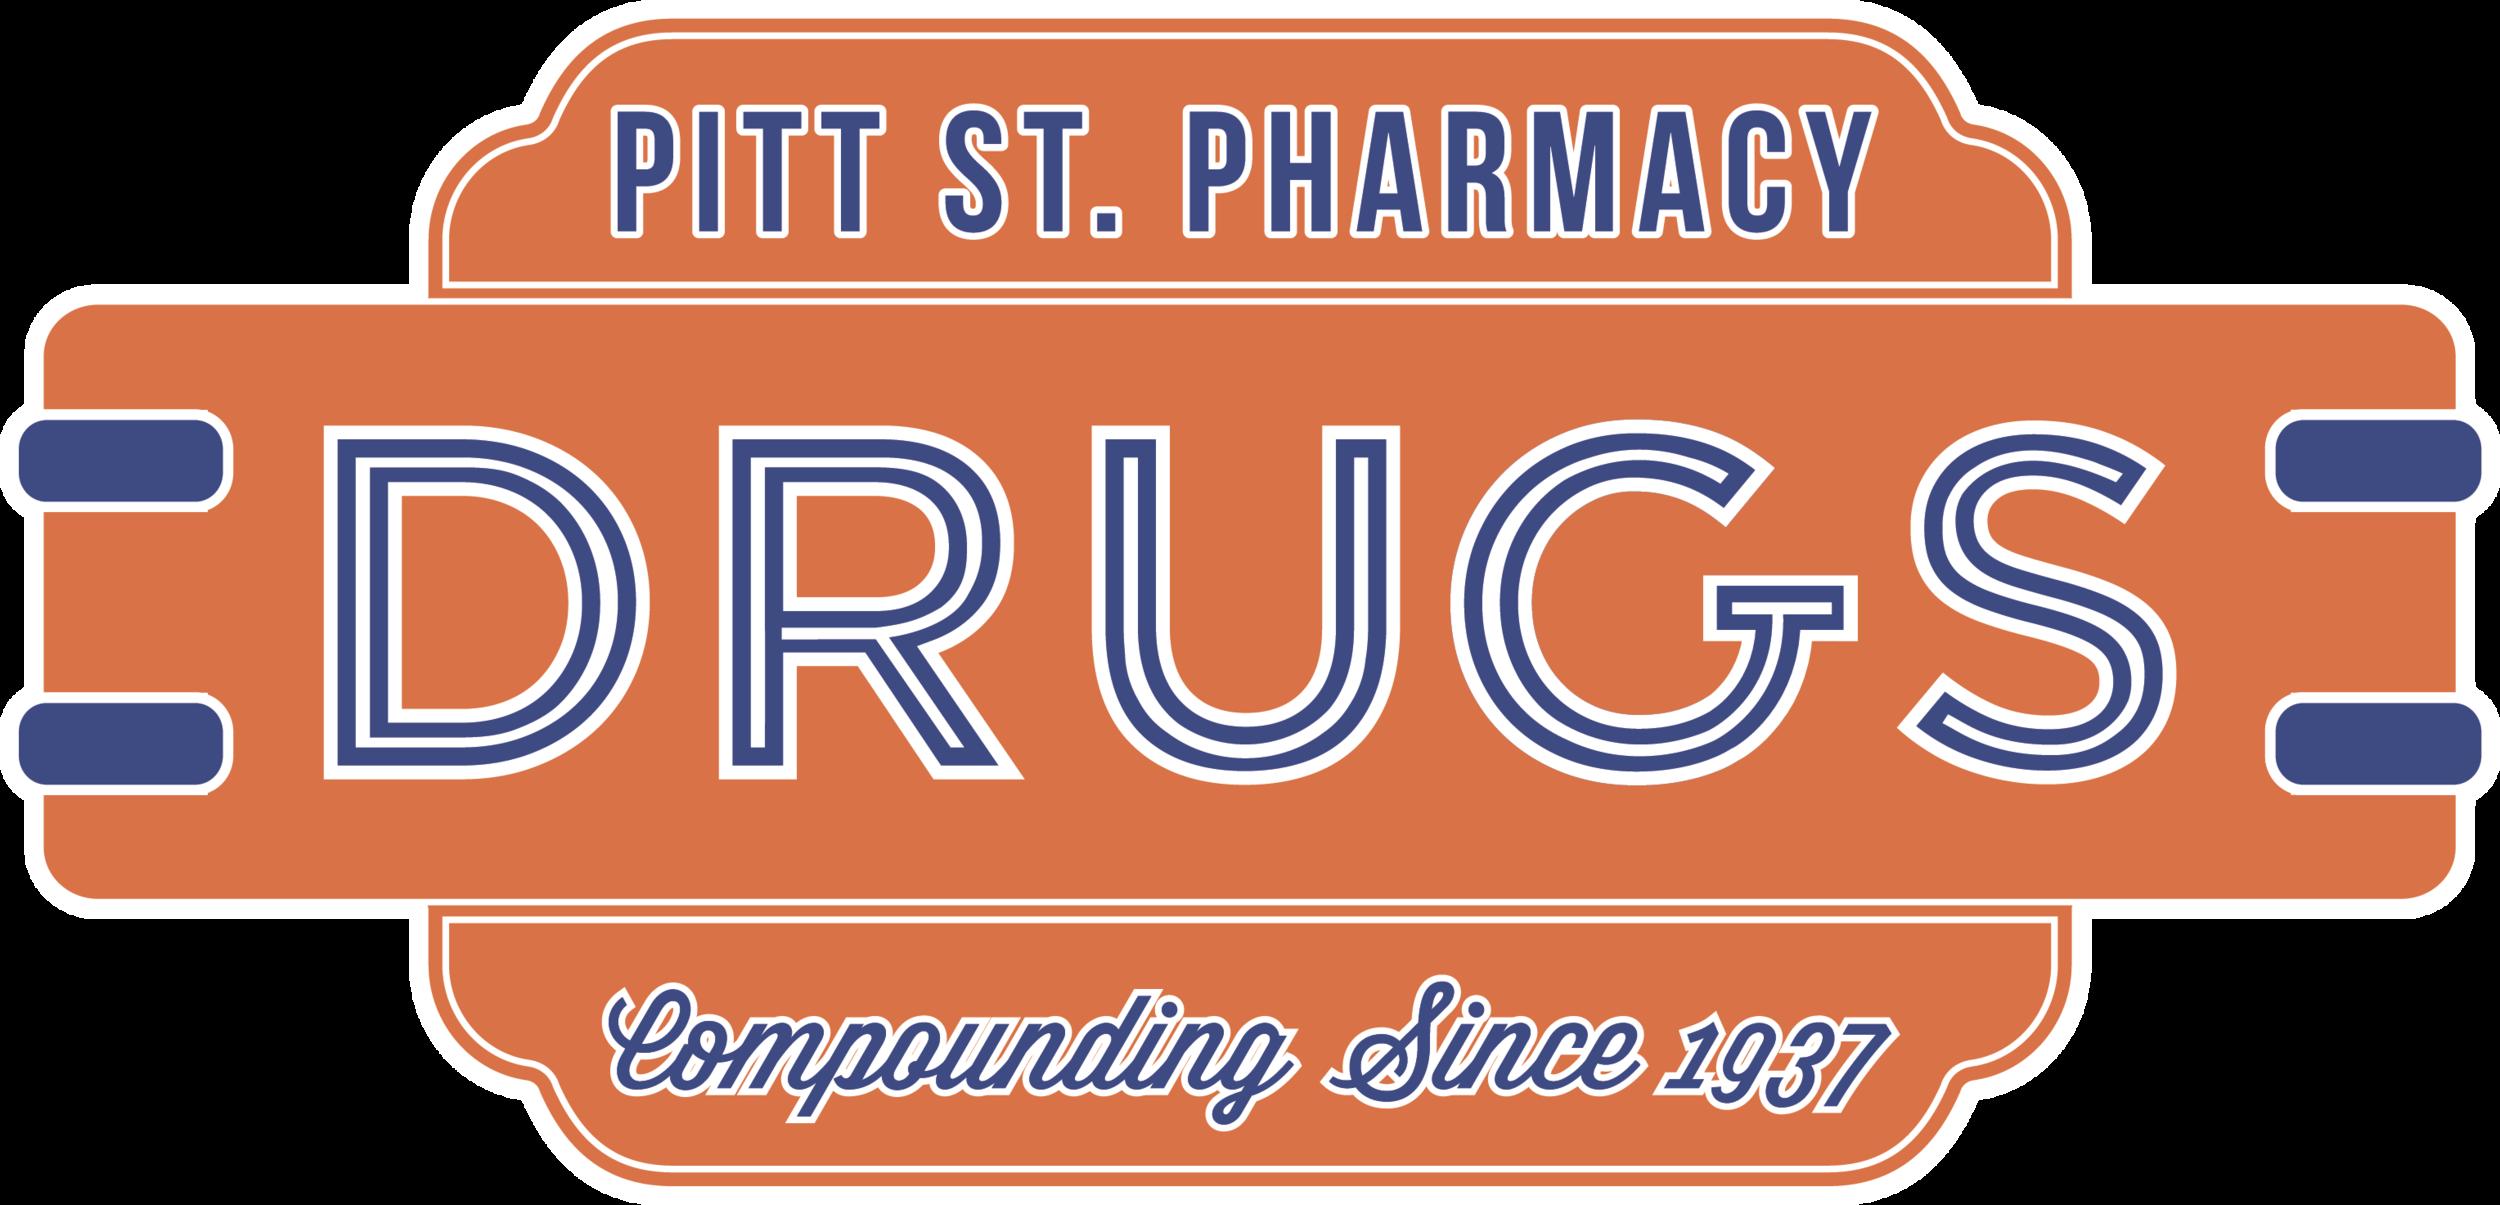 Pitt Street Pharmacy  111 Pitt St, Mt Pleasant, SC 29464